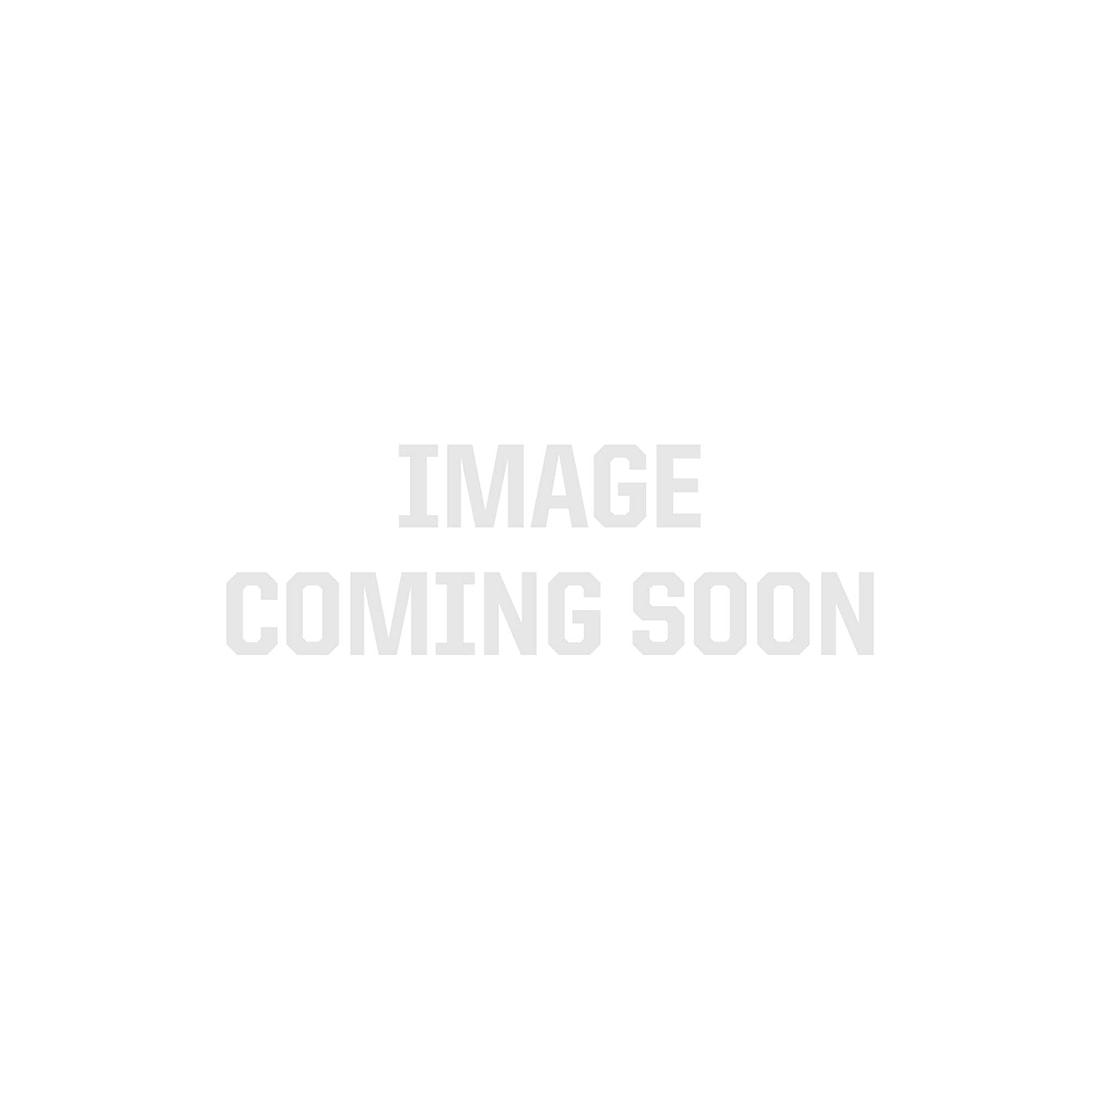 Pink 3528 Single Row LED Strip Light, 240/m, 10mm wide, Sample Kit